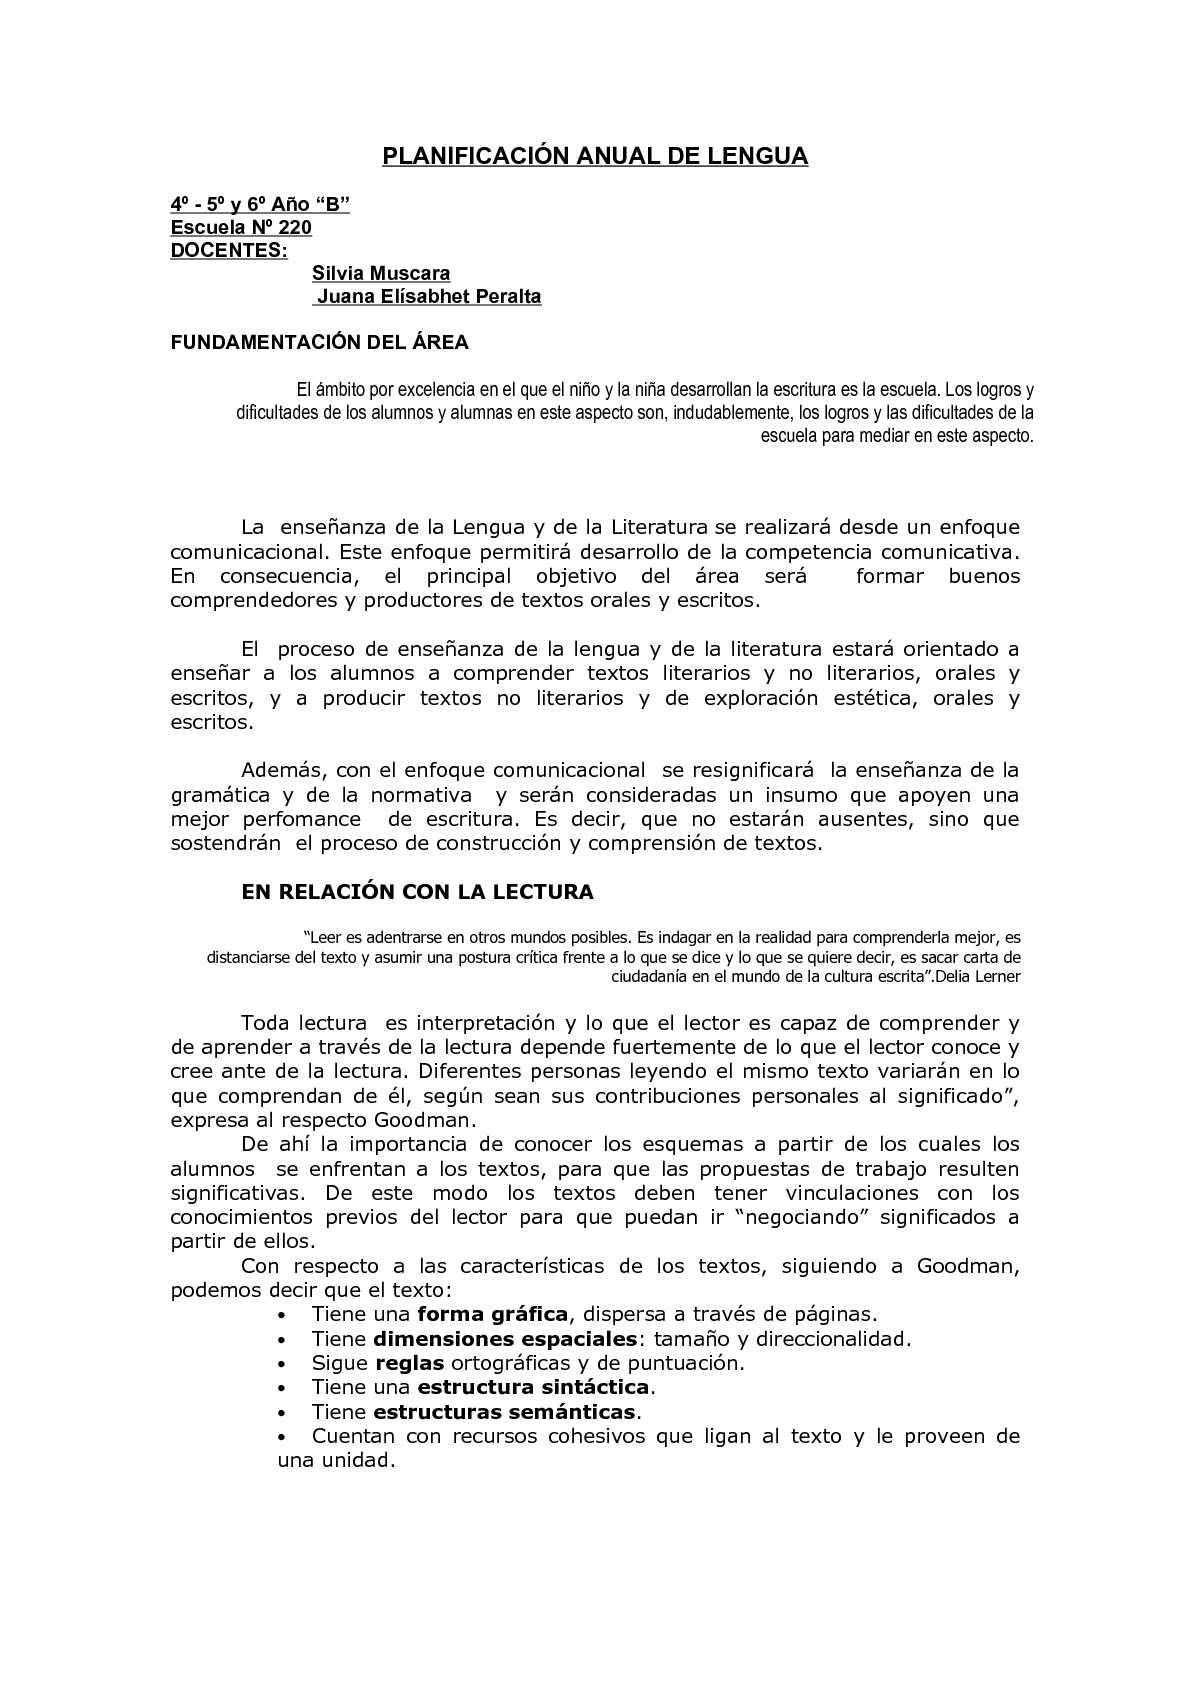 Calaméo - Planificación Anual Lengua 2º Ciclo Escuela Primaria